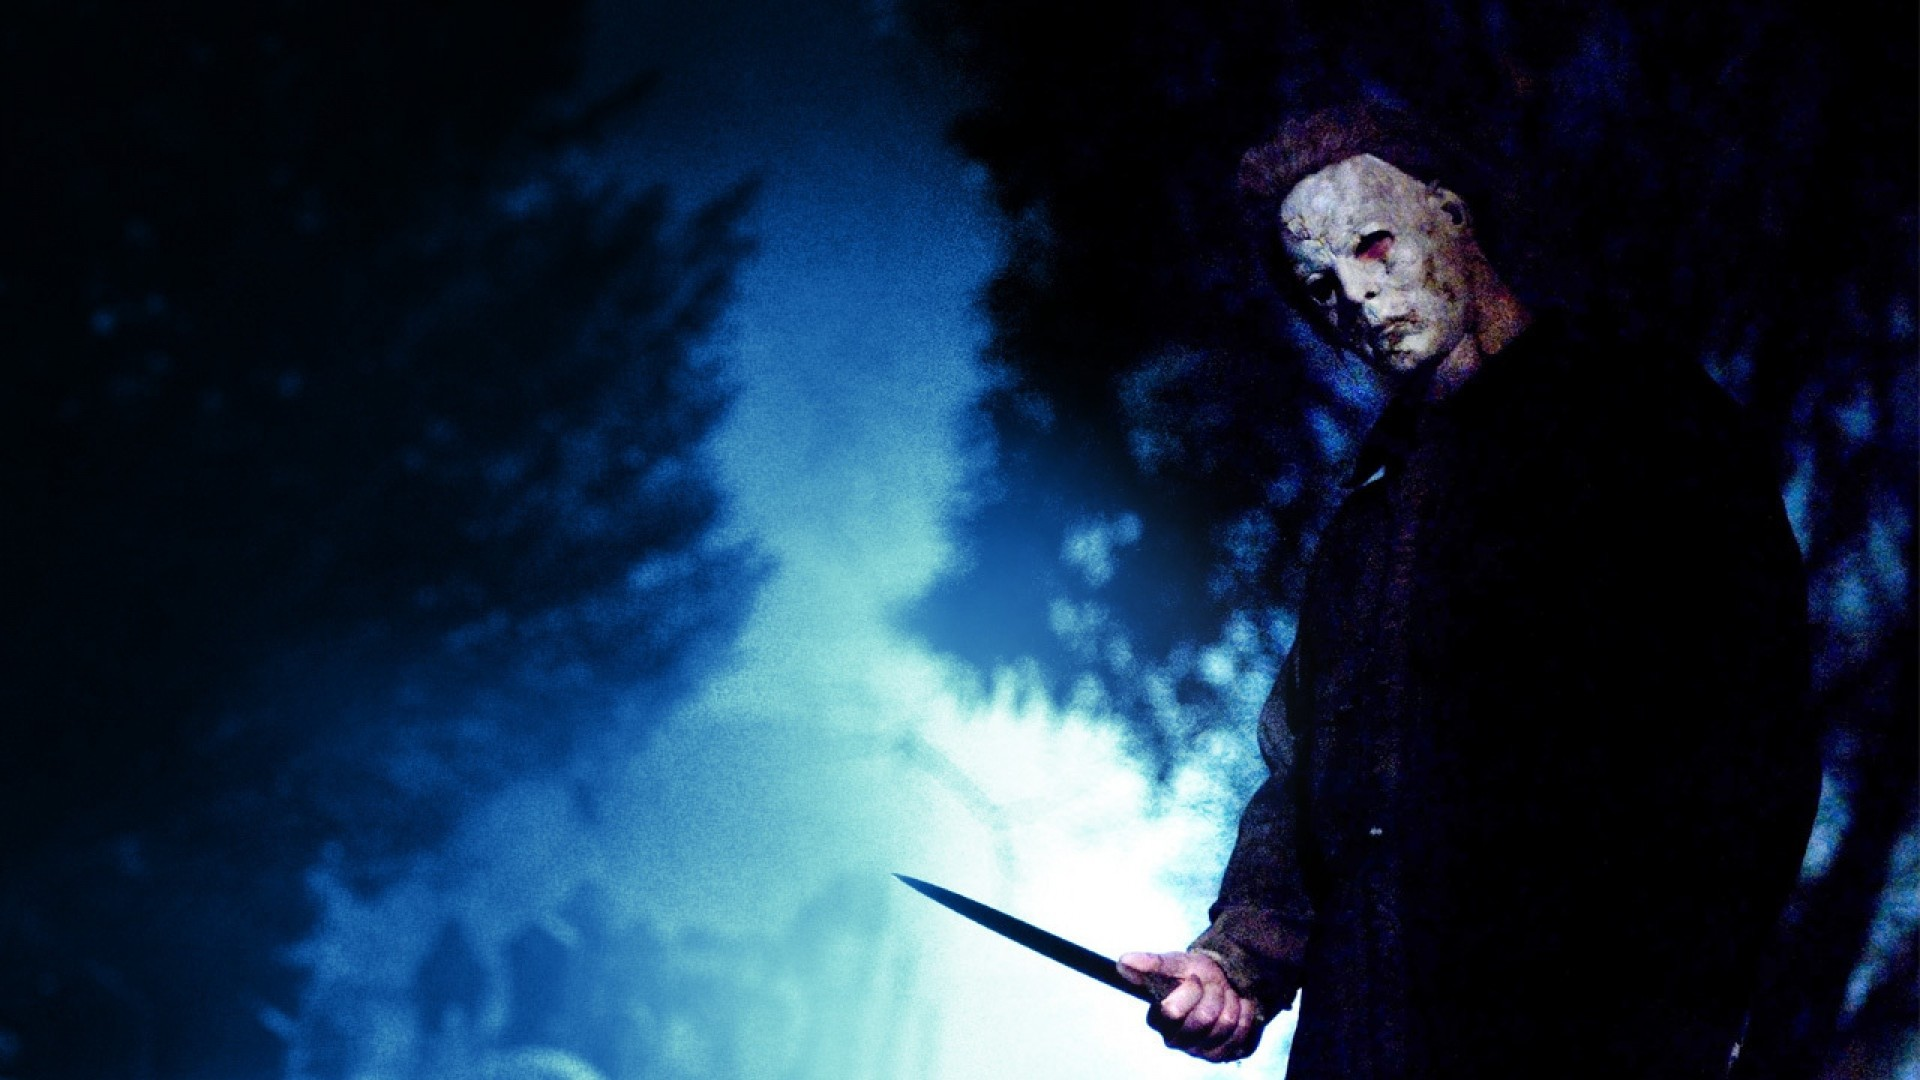 … Background Full HD 1080p. Wallpaper michael myers, maniac,  killer, knife, mask, fear, horror